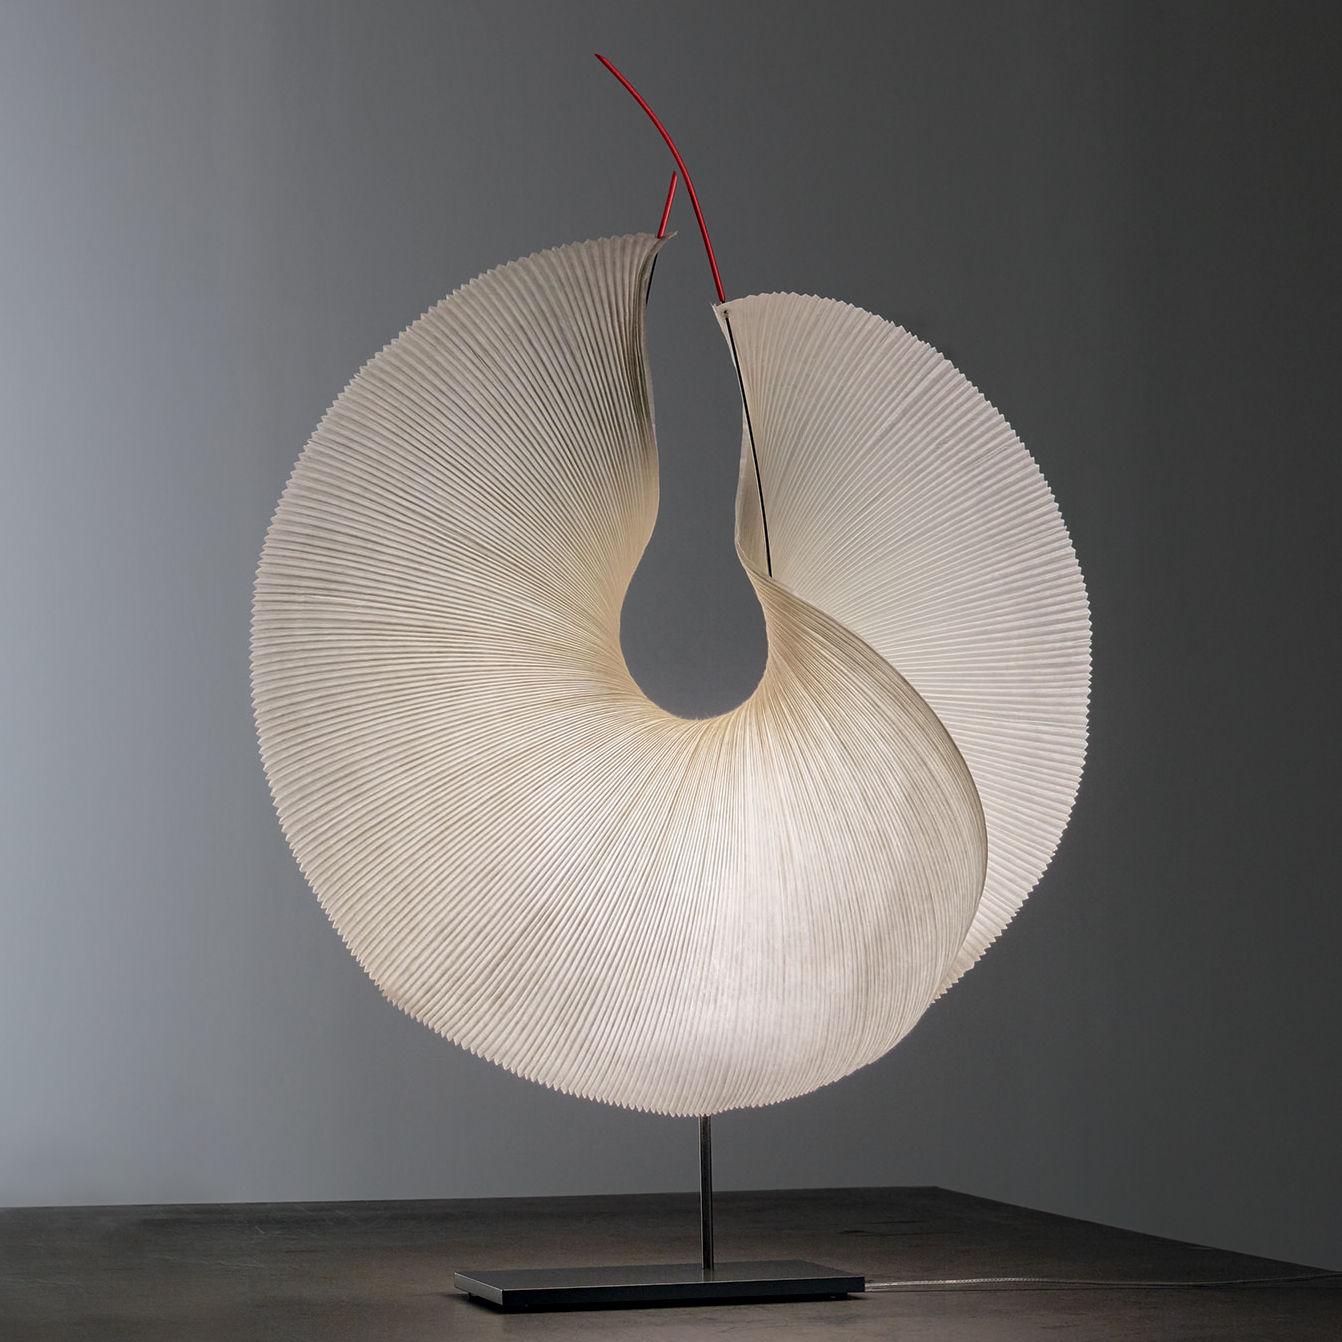 lampe de table the mamo nouchies led yoruba rose beige ingo maurer made in design. Black Bedroom Furniture Sets. Home Design Ideas